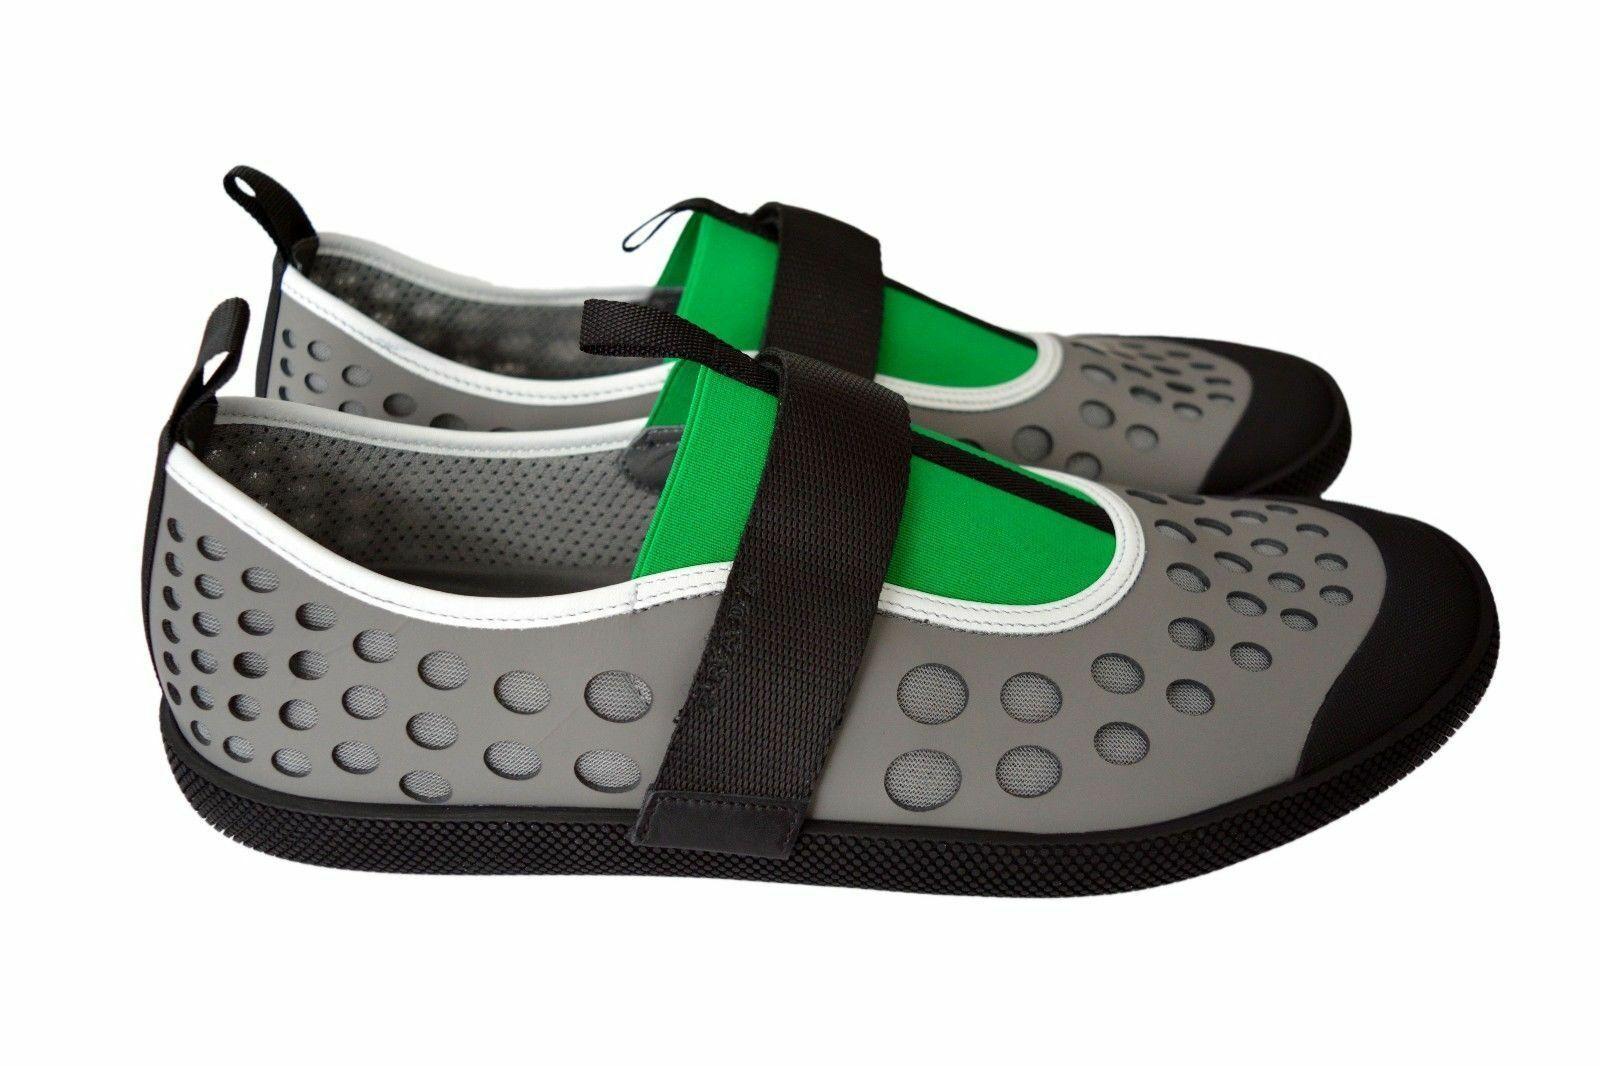 New Authentic PRADA Leather Mens Sneakers Shoes Schuhe Sz US12 EU45 UK11 2OG042